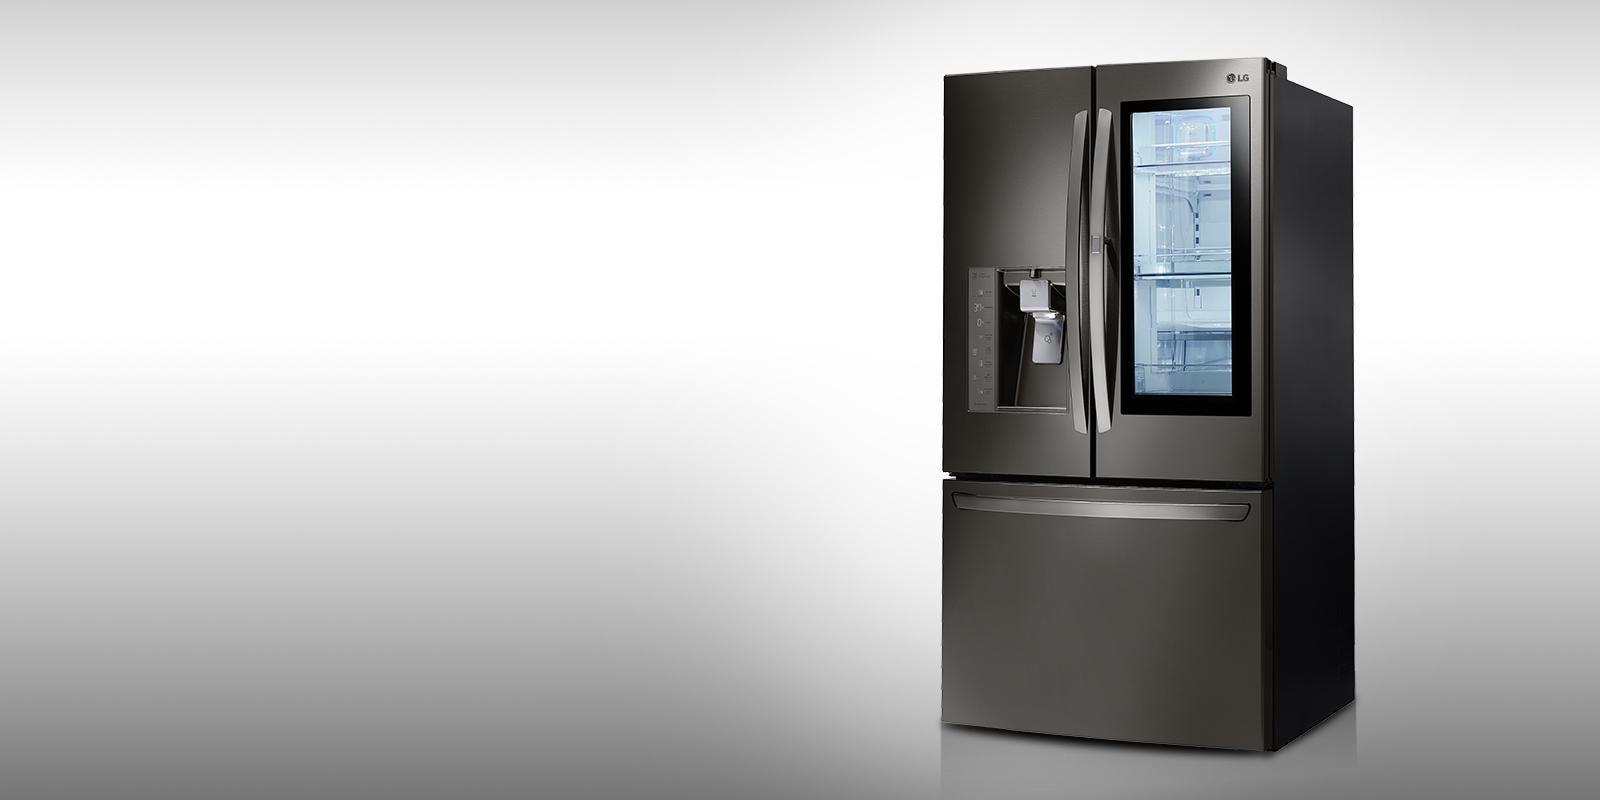 lg refrigerator lmxs27626d. raid the fridge without losing your cool lg refrigerator lmxs27626d t